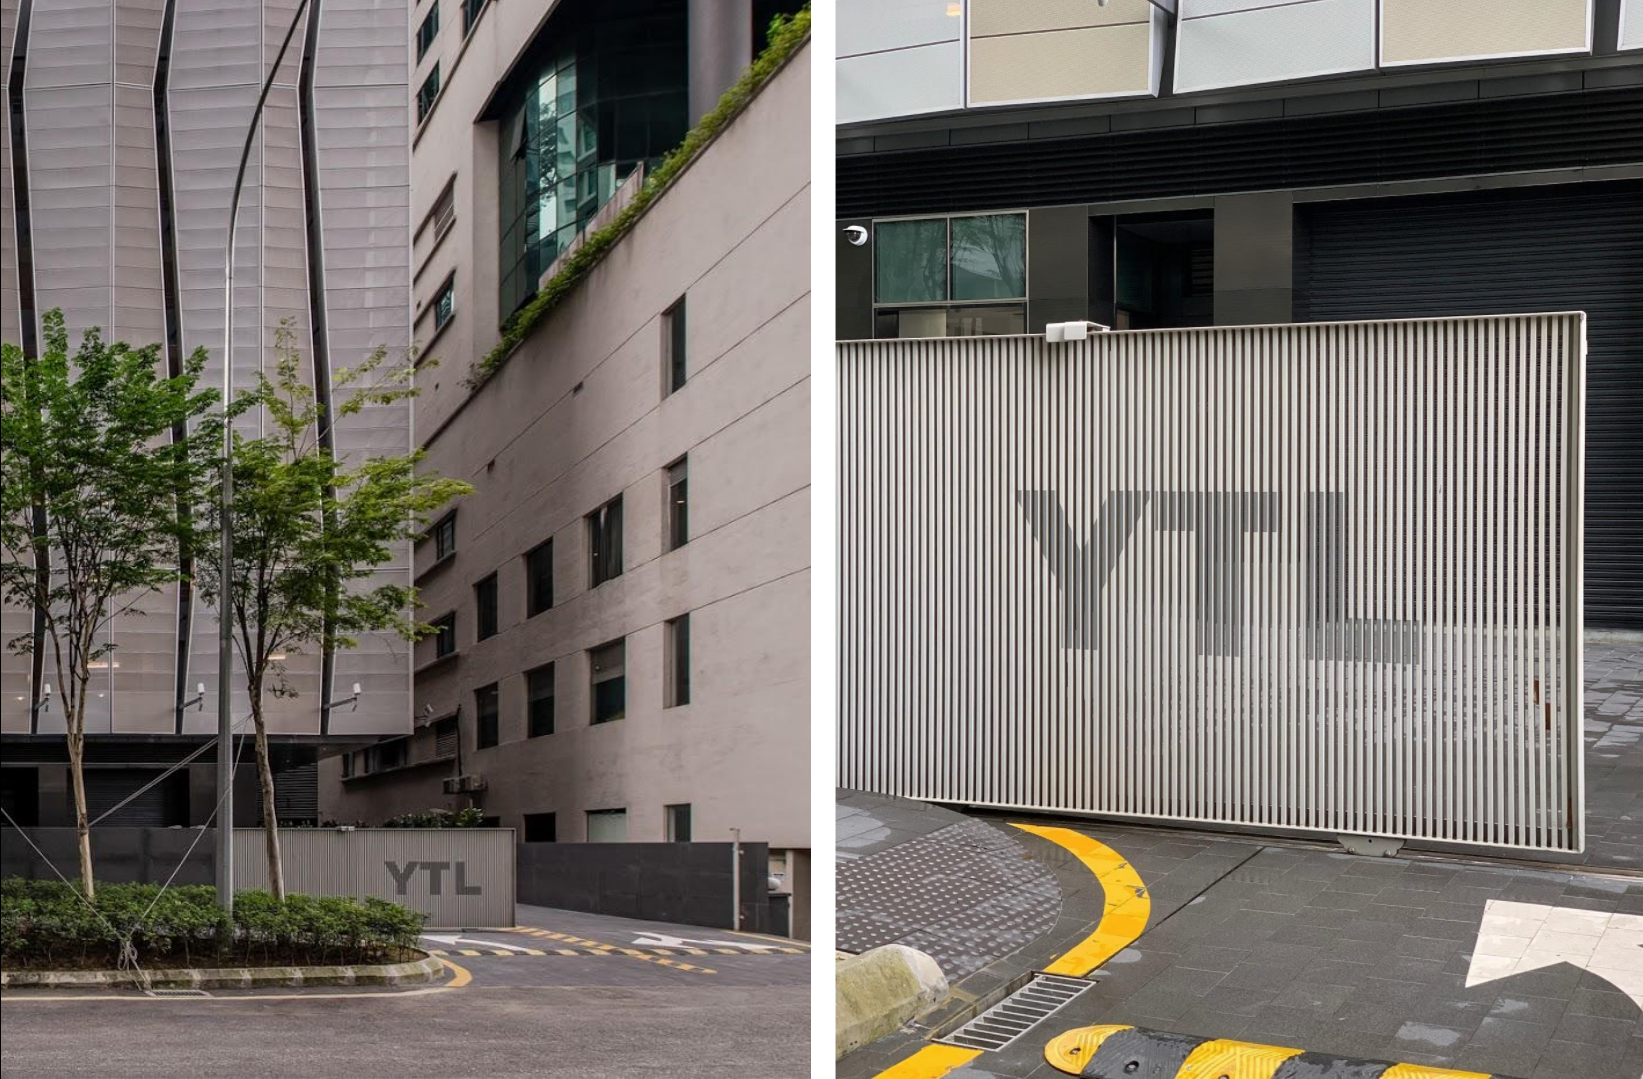 ytl-back-gate